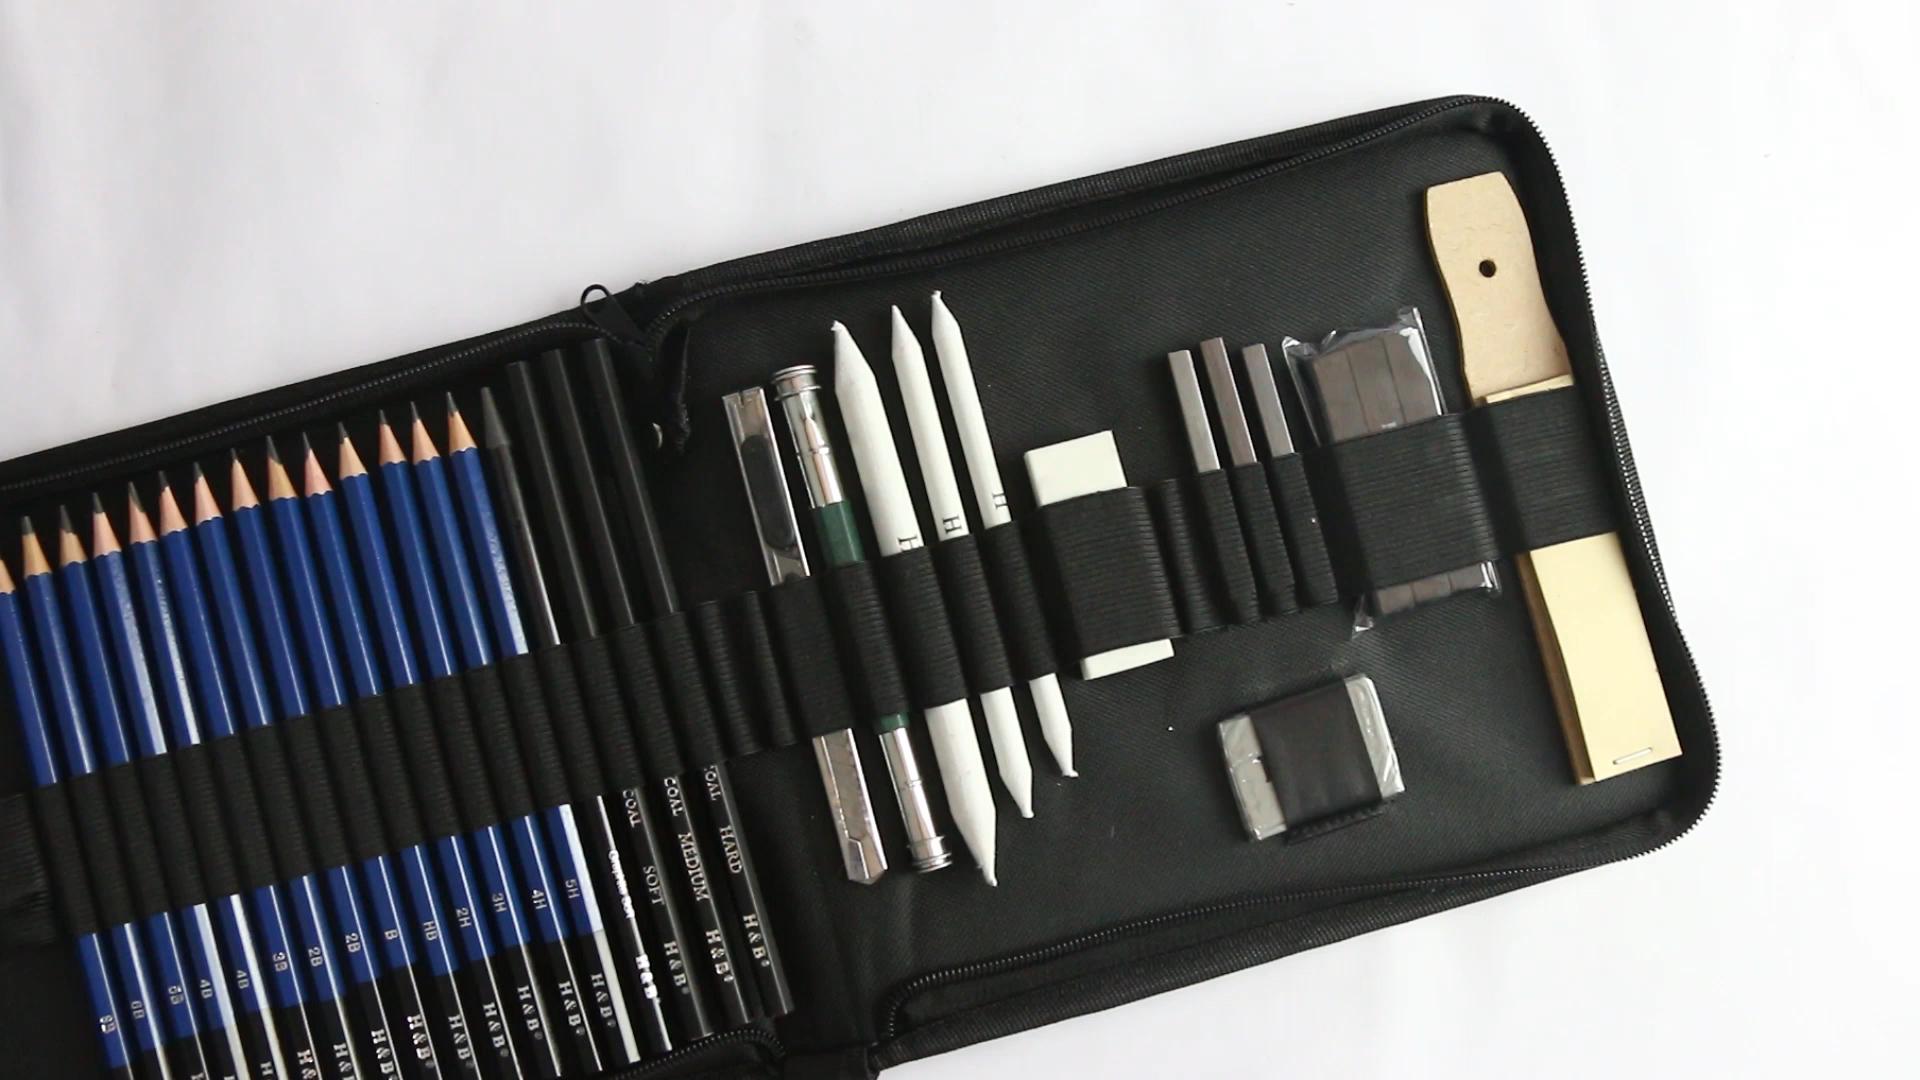 35pcs 스케치 연필 세트 전문 스케치 드로잉 연필 세트 나일론 가방